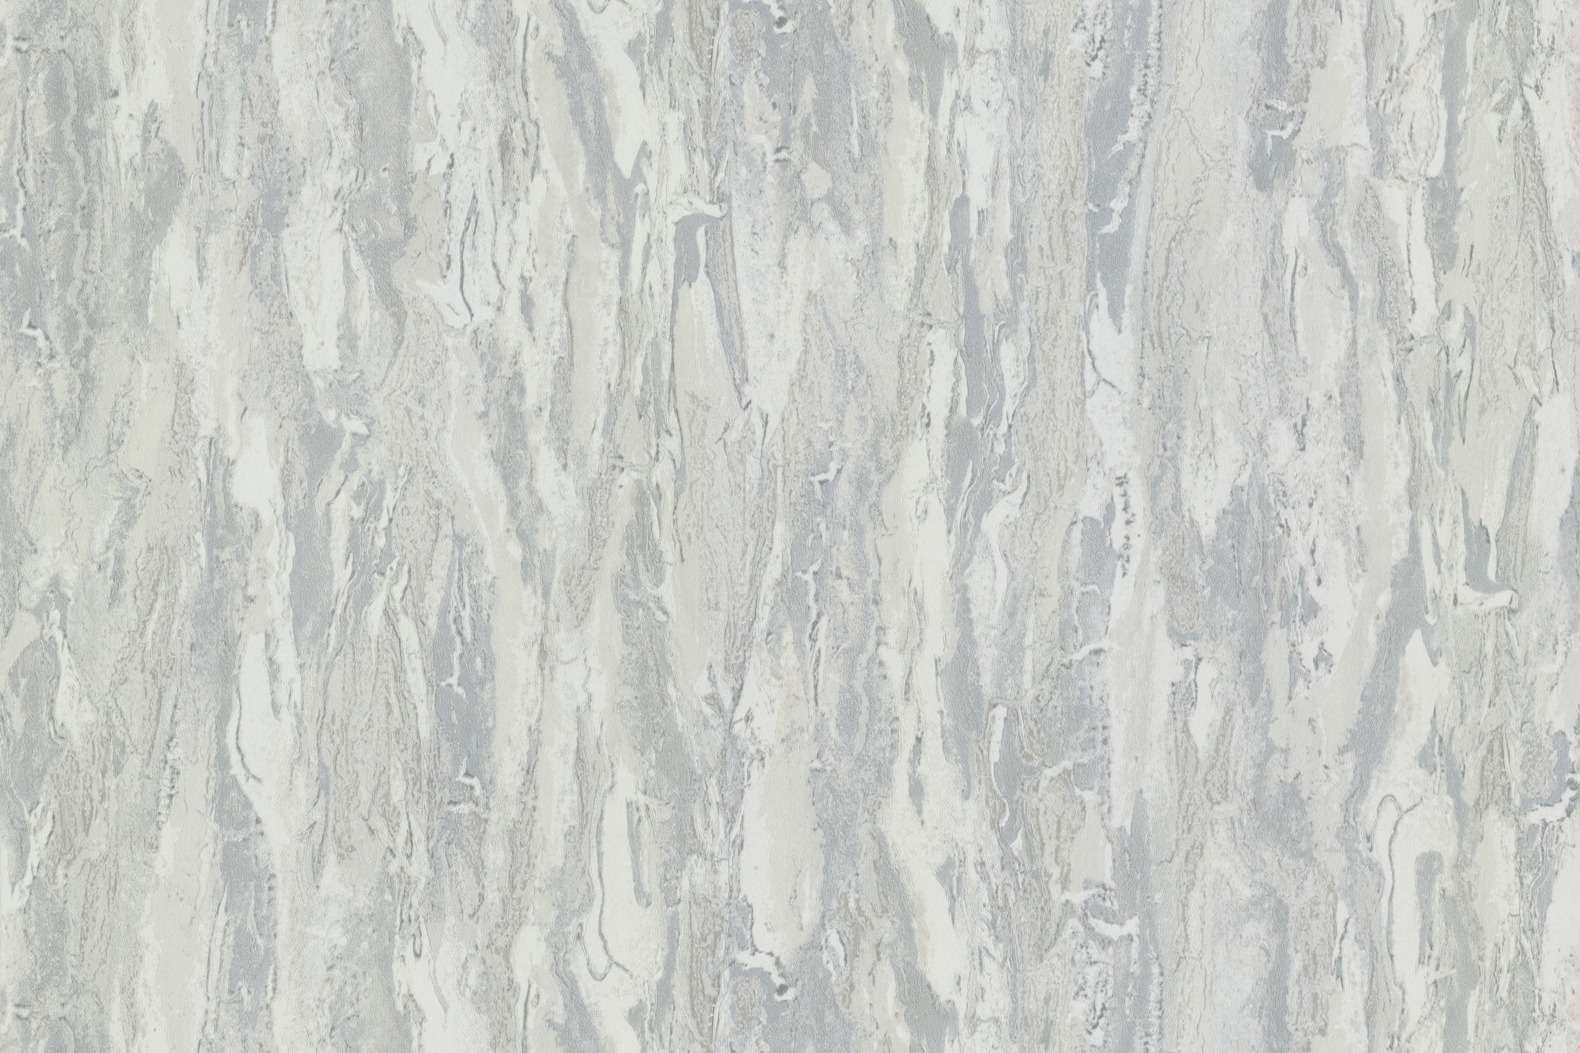 Обои Decori & Decori Carrara 2 — Декори Каррара 2 83693